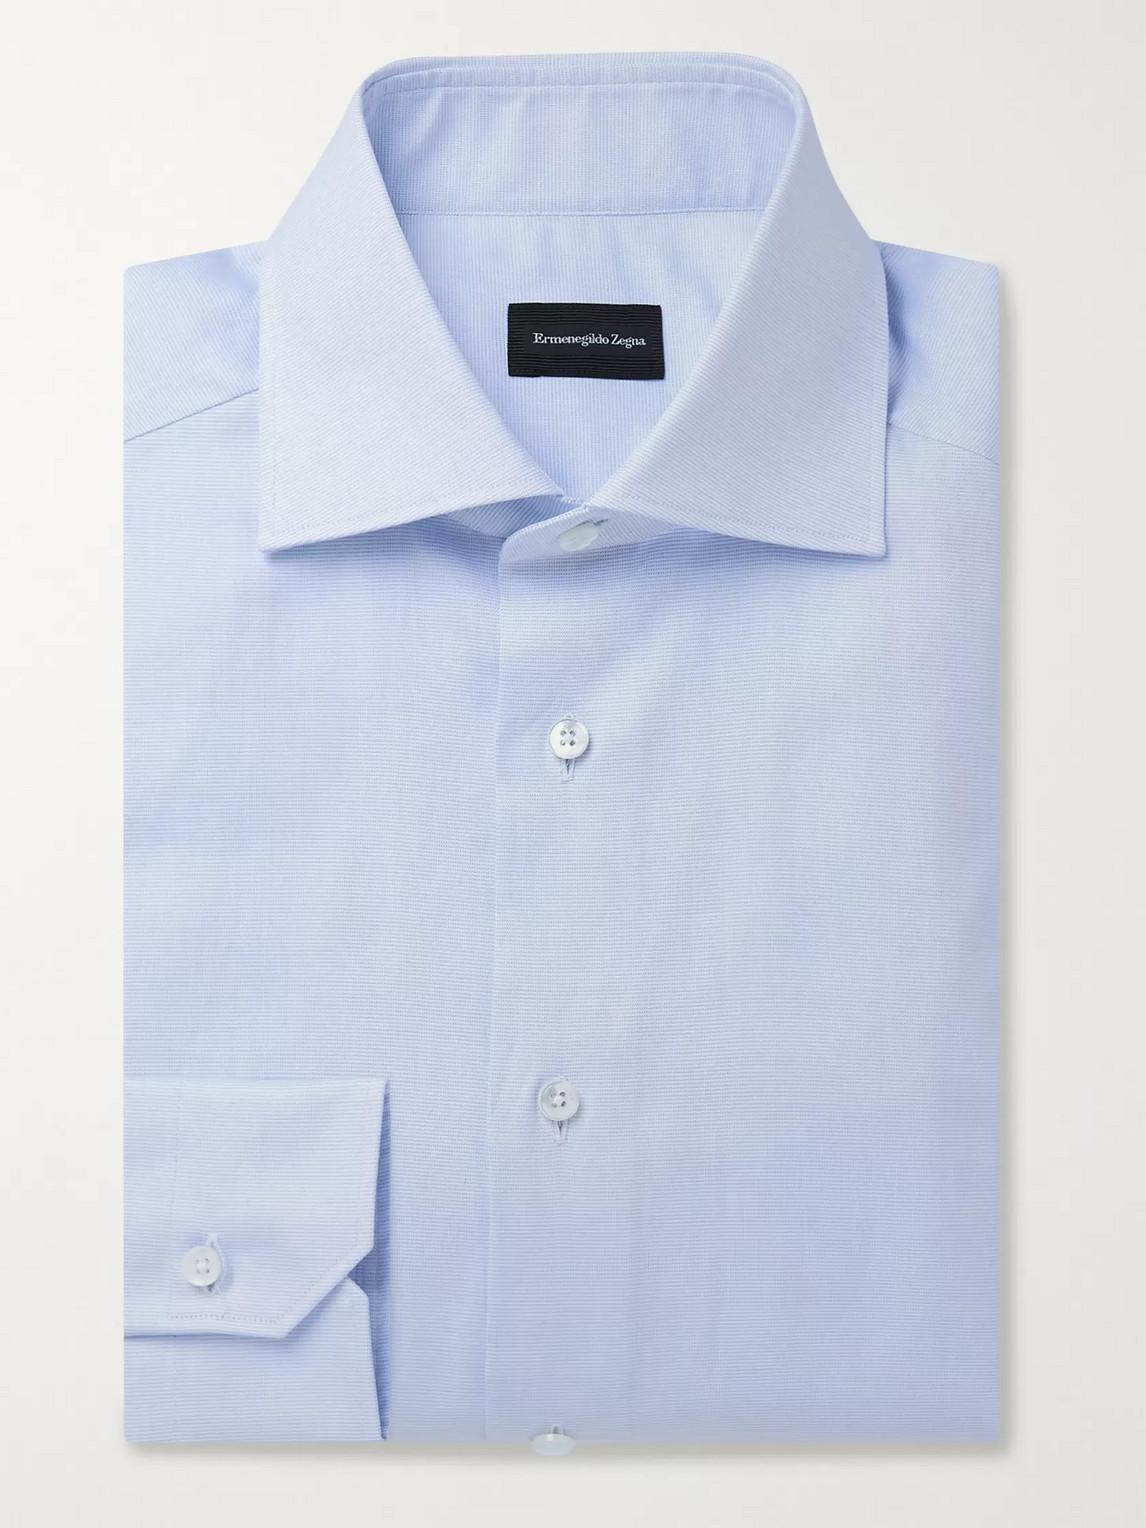 Ermenegildo Zegna Cutaway Collar Cotton-oxford Shirt In Blue